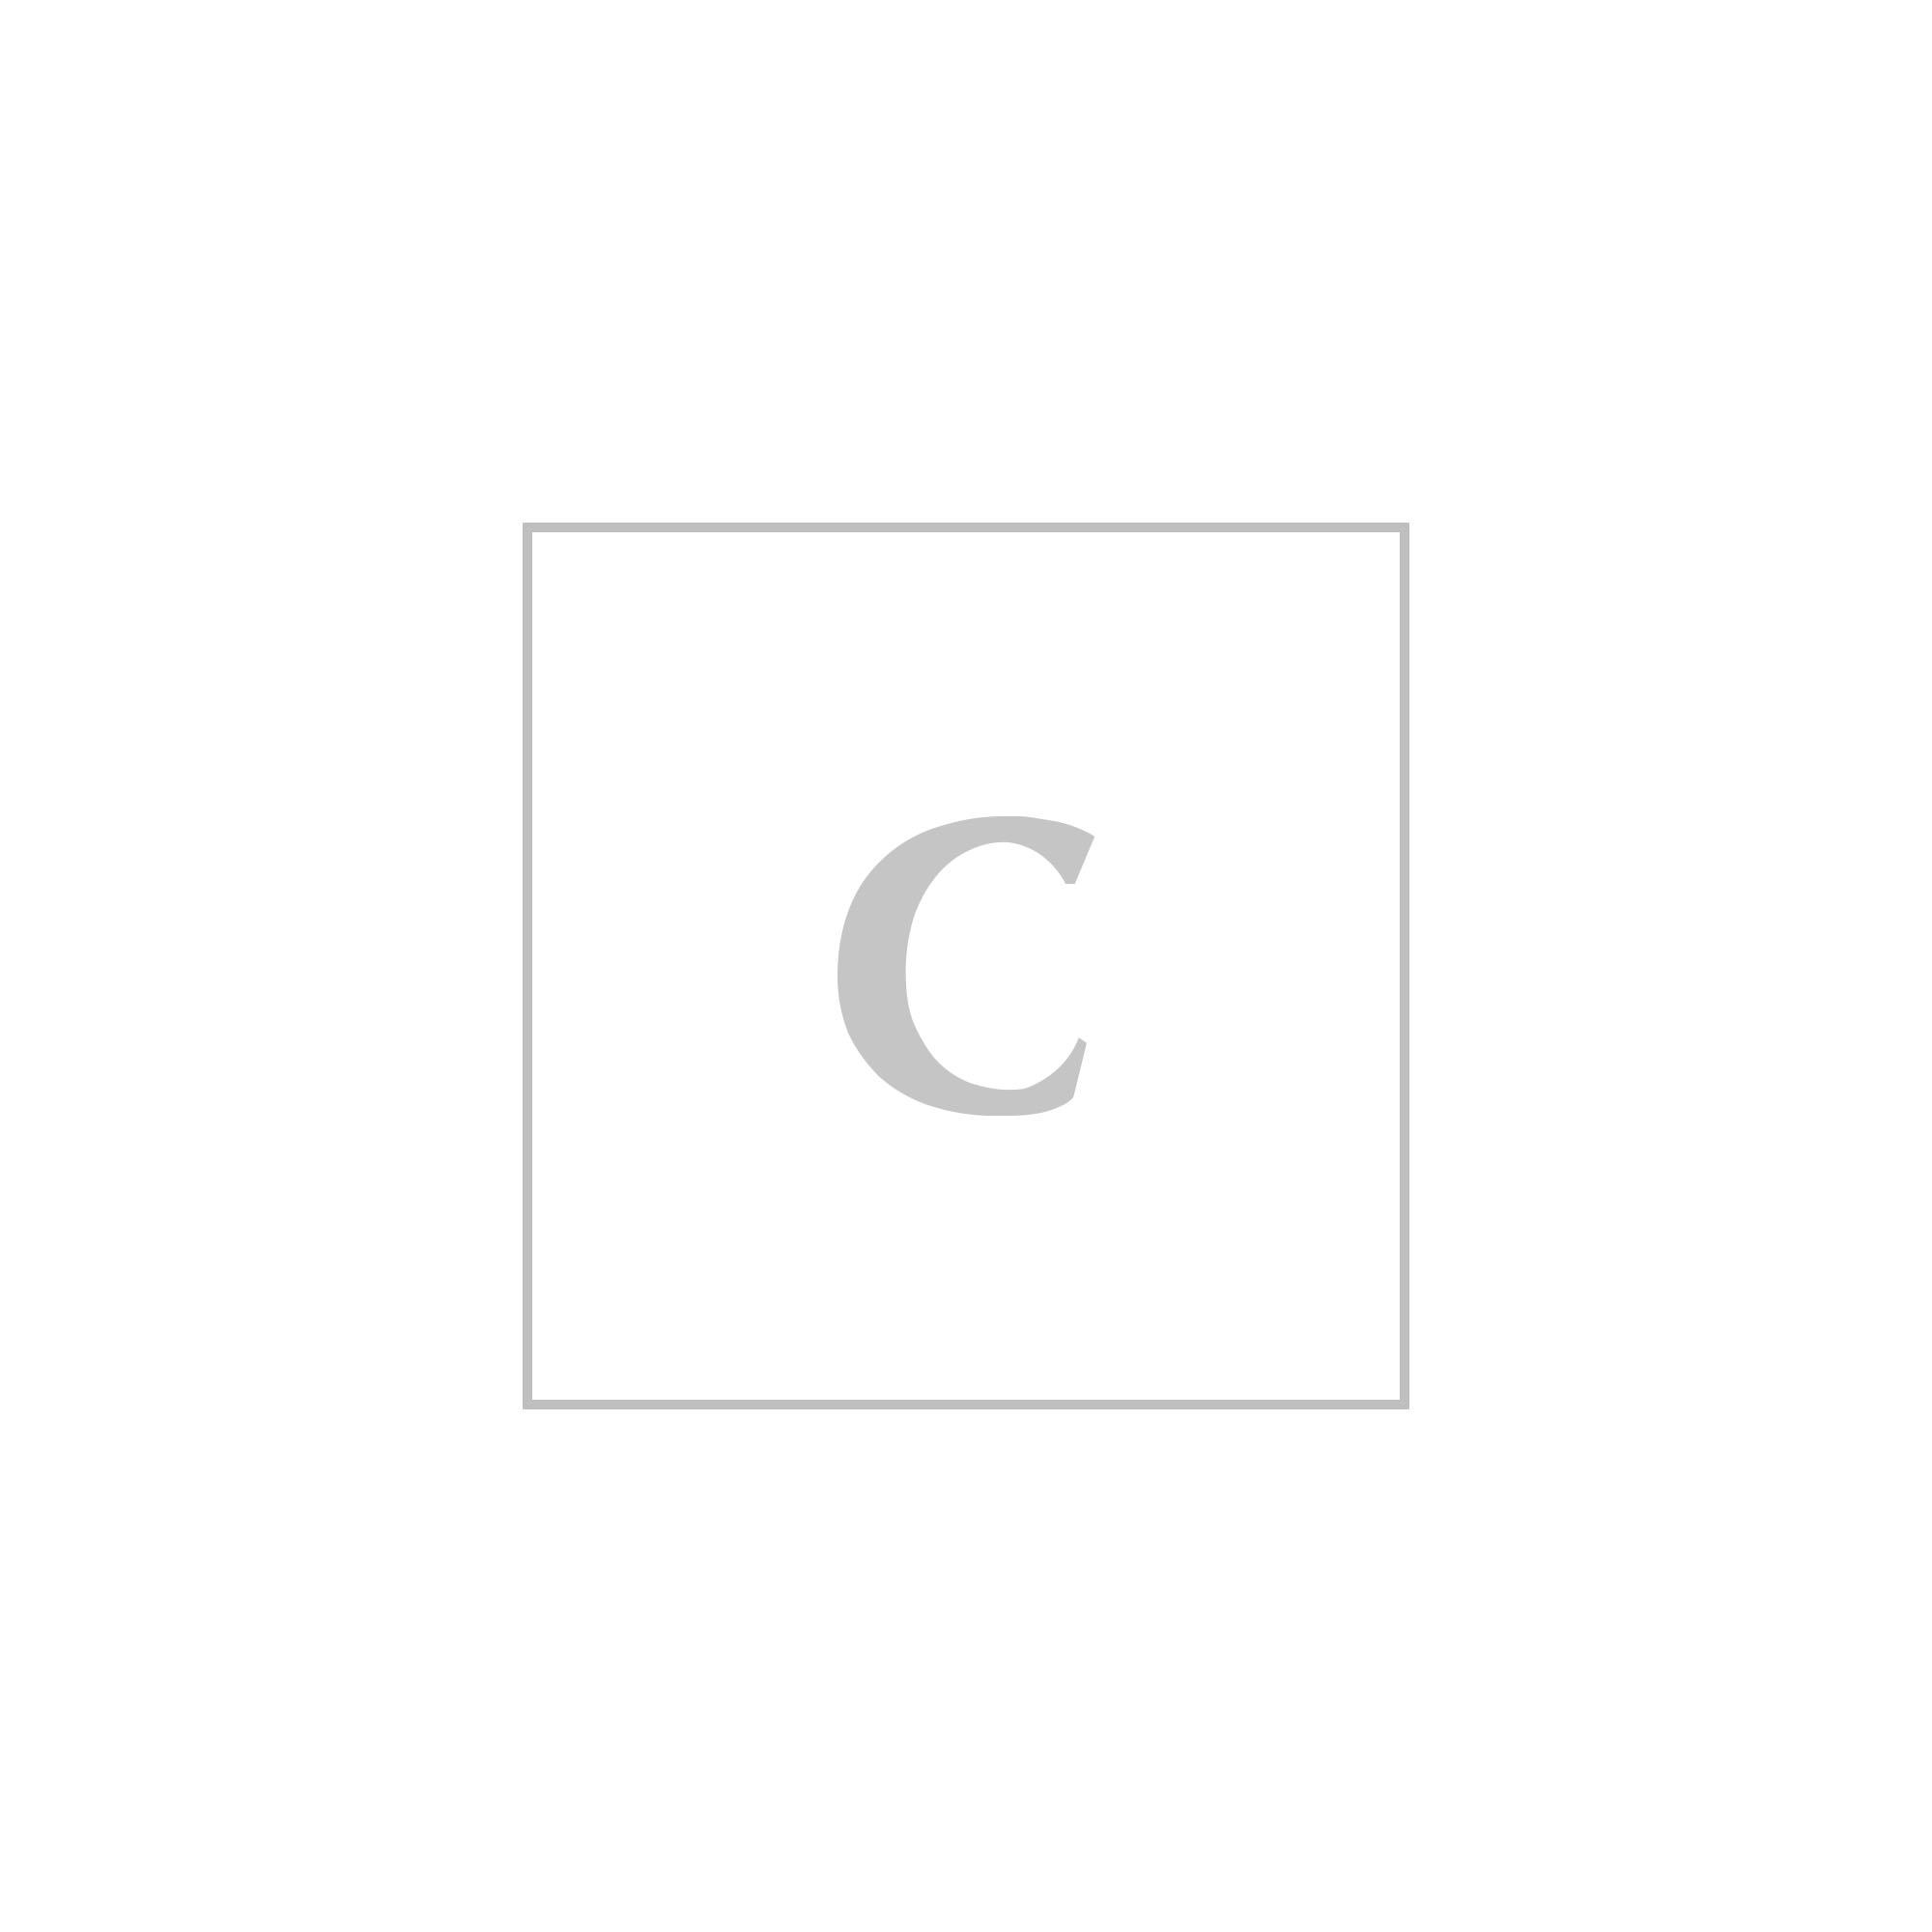 Dolce & gabbana slingback vernice gloss stampata bellucci